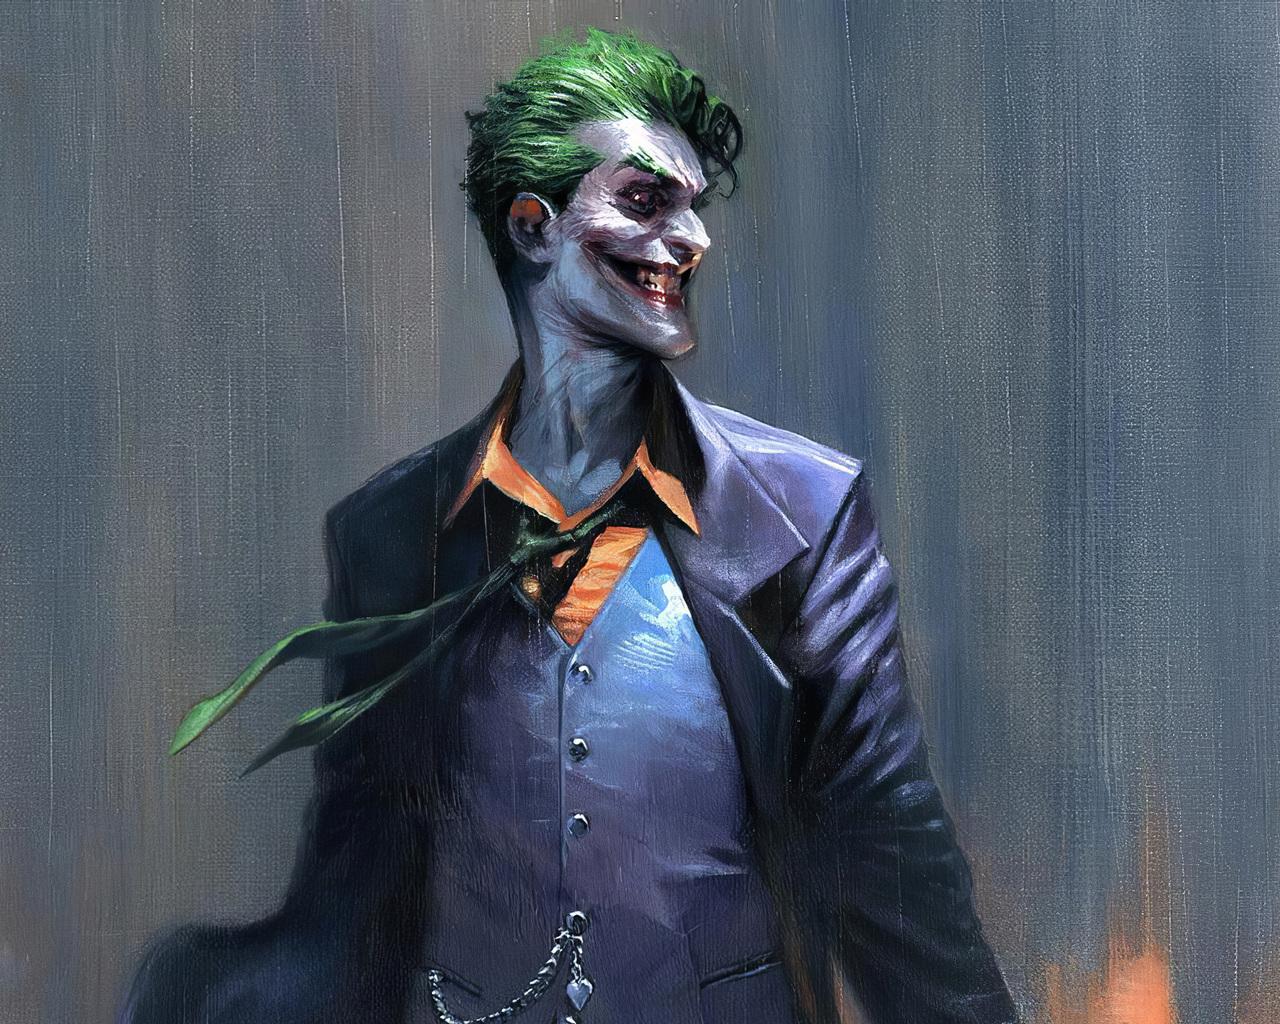 joker-after-robbery-1f.jpg